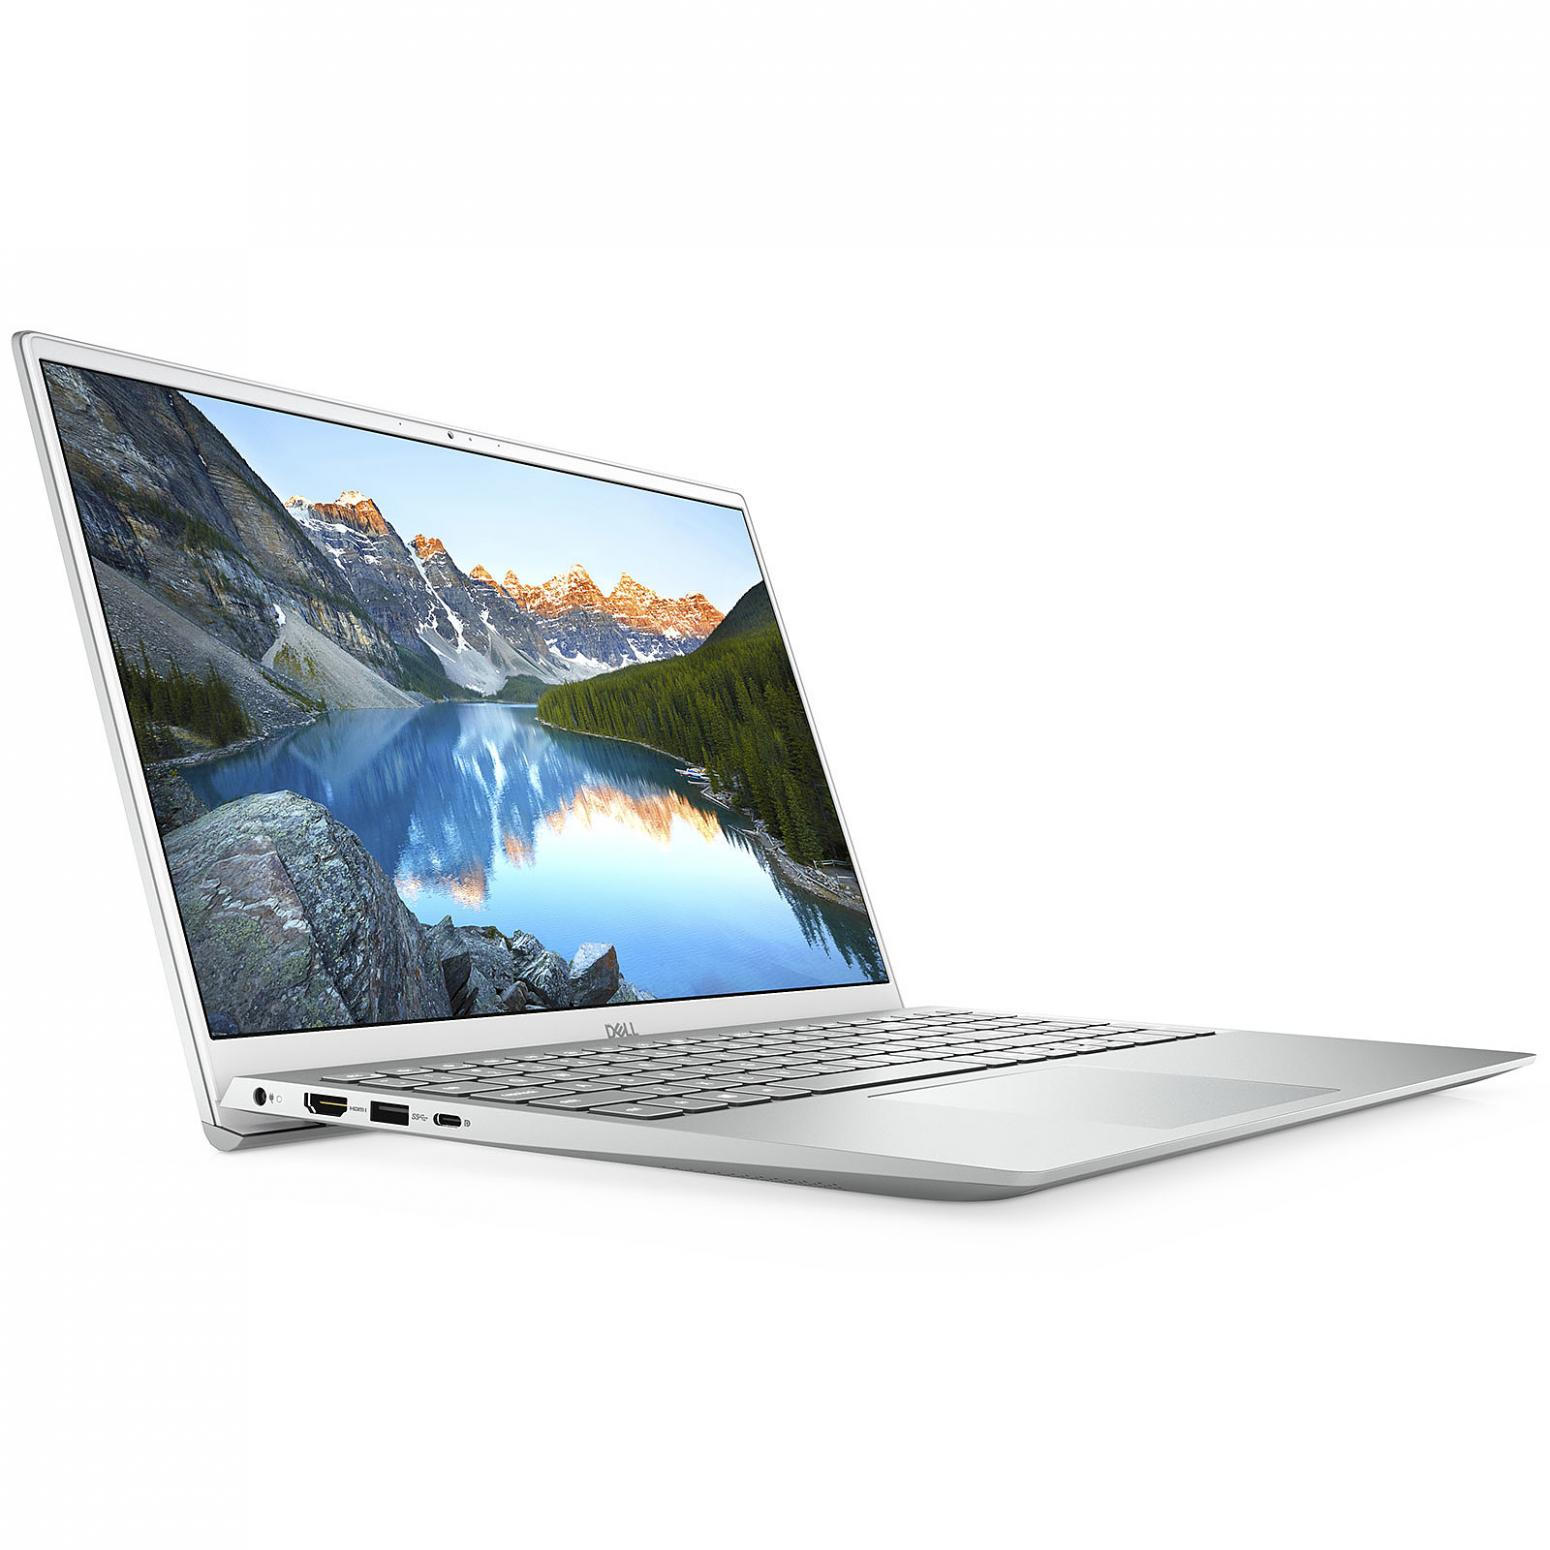 Image du PC portable Dell Inspiron 15 5502 Argent - Core i5, SSD 256 Go